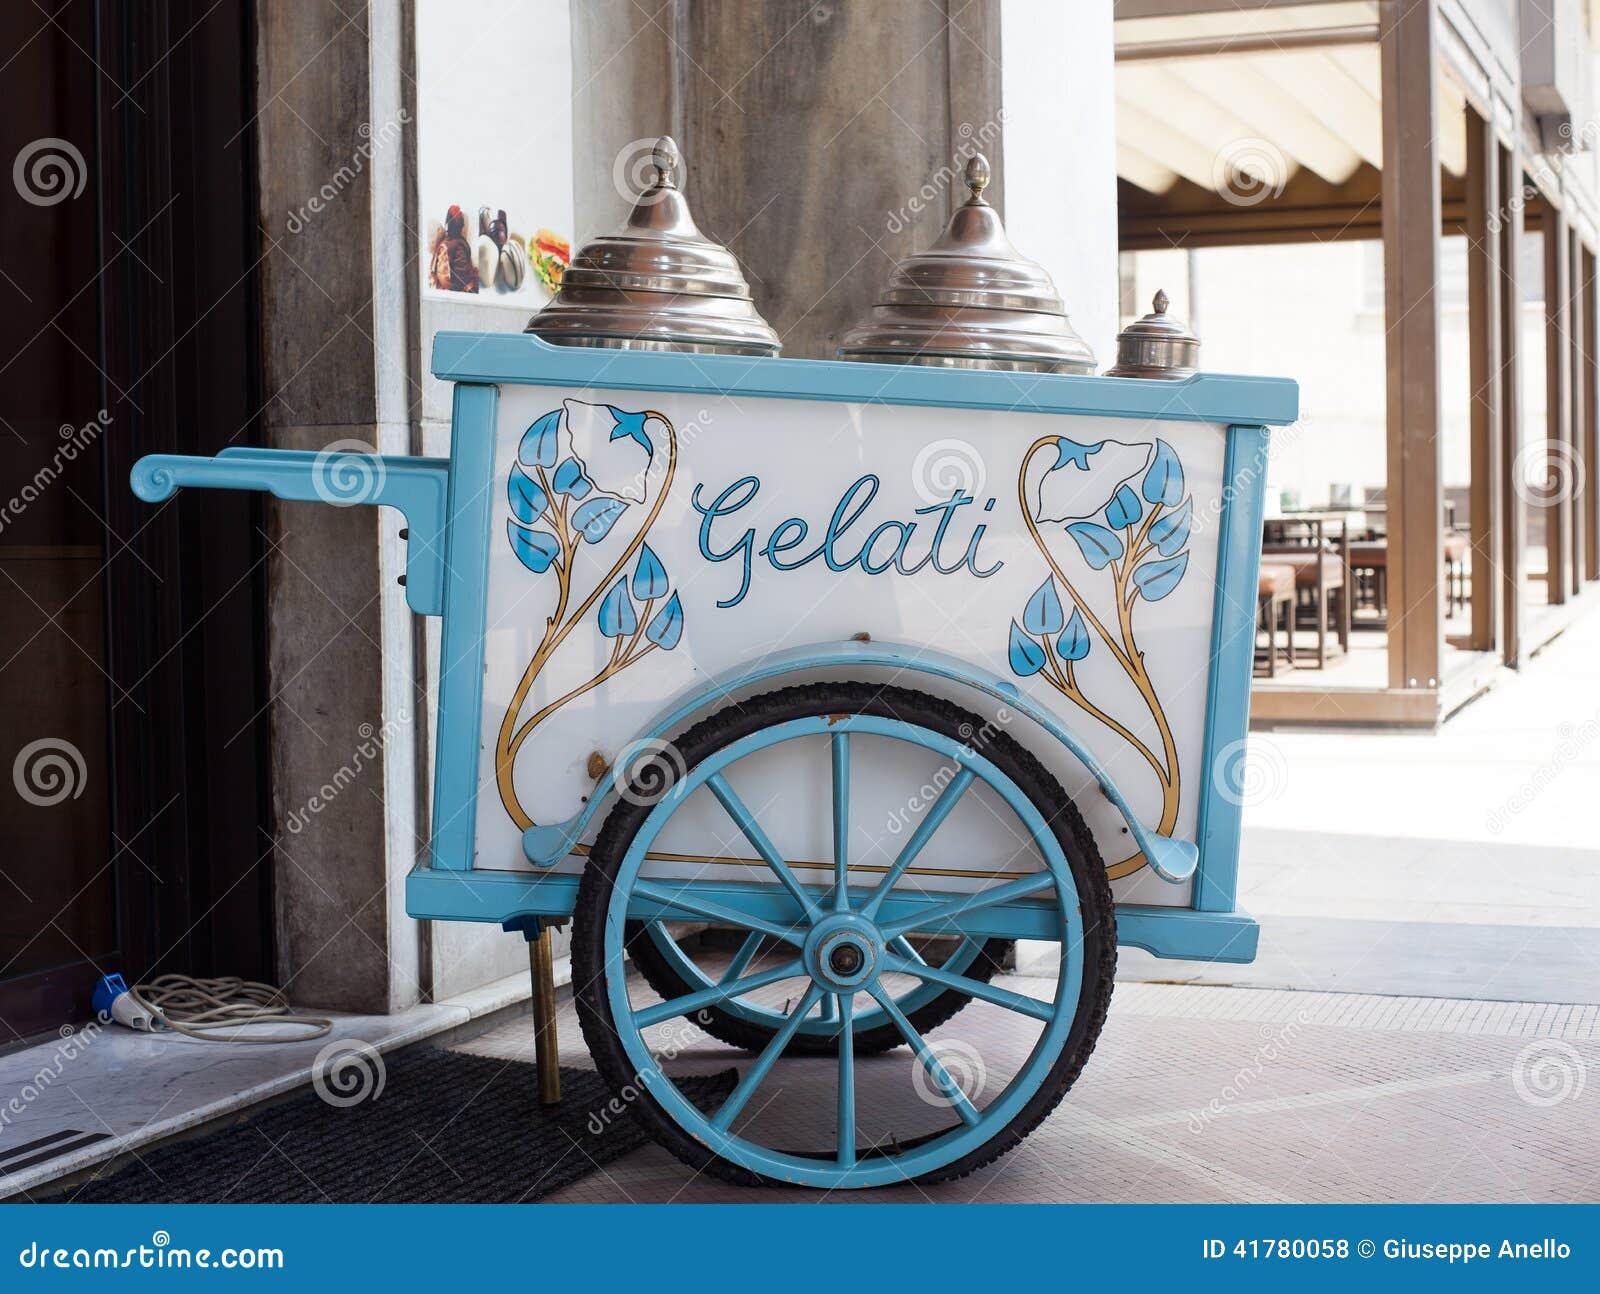 Vintage Ice Cream Cart 22